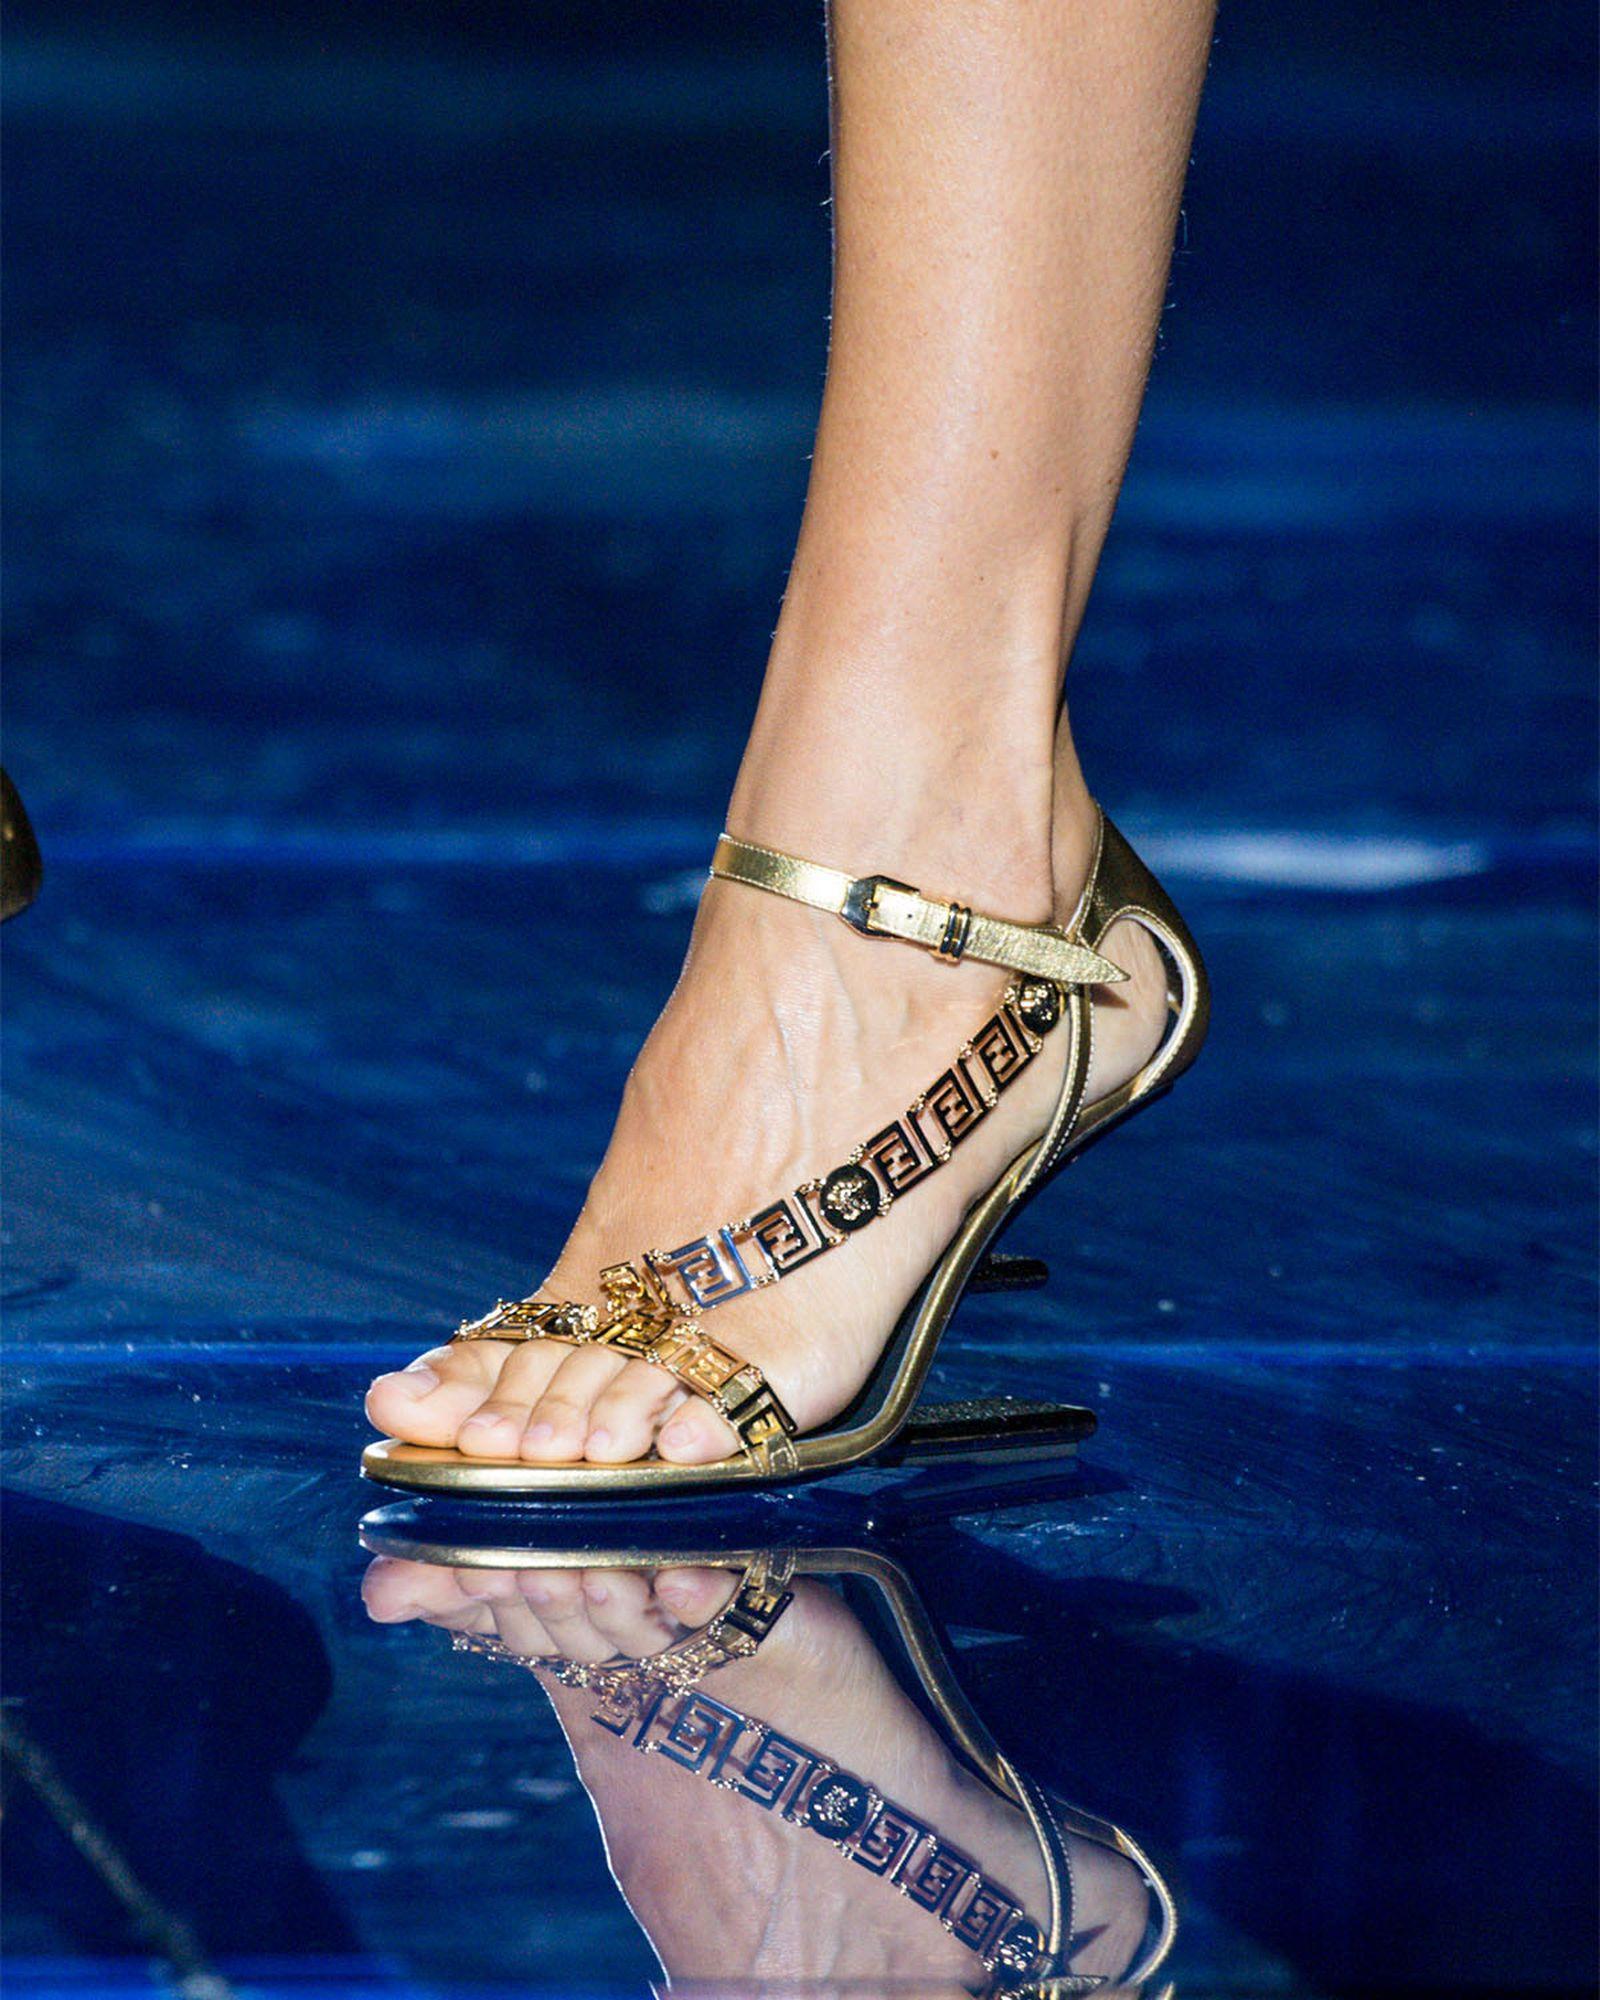 heels-spring-summer-2022-trend-01